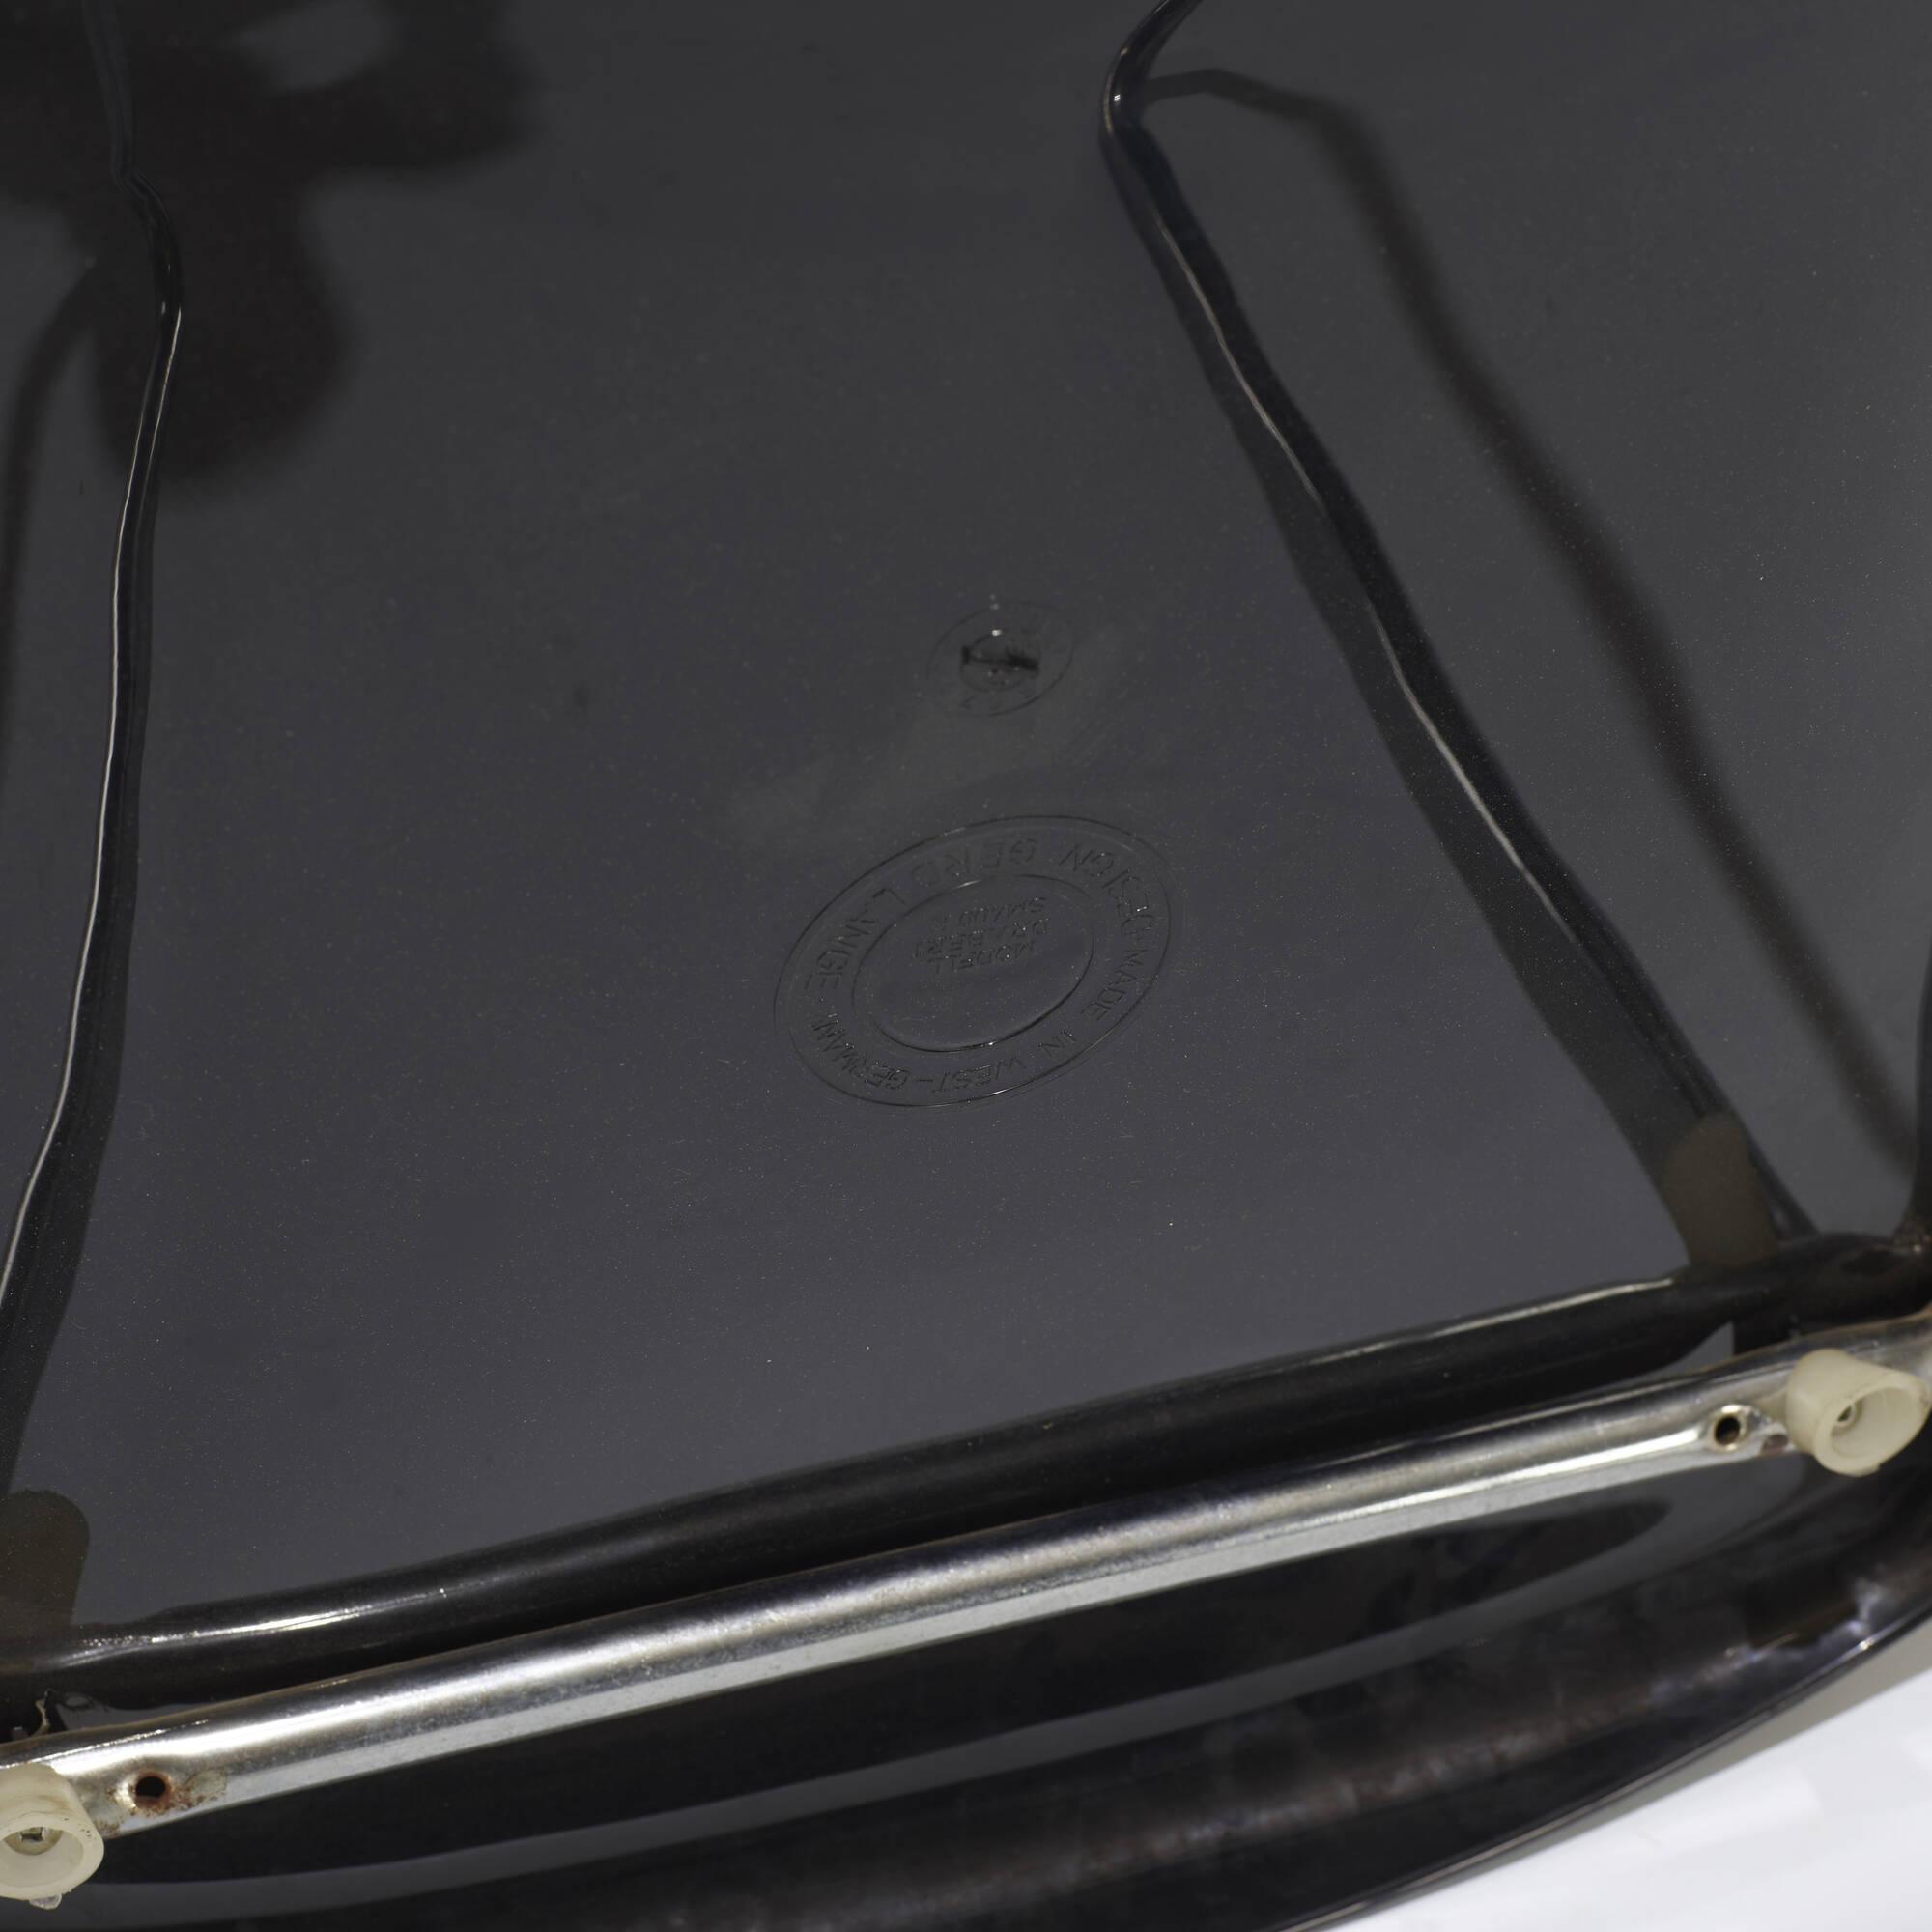 432: Gerd Lange / SM400K chair (3 of 3)